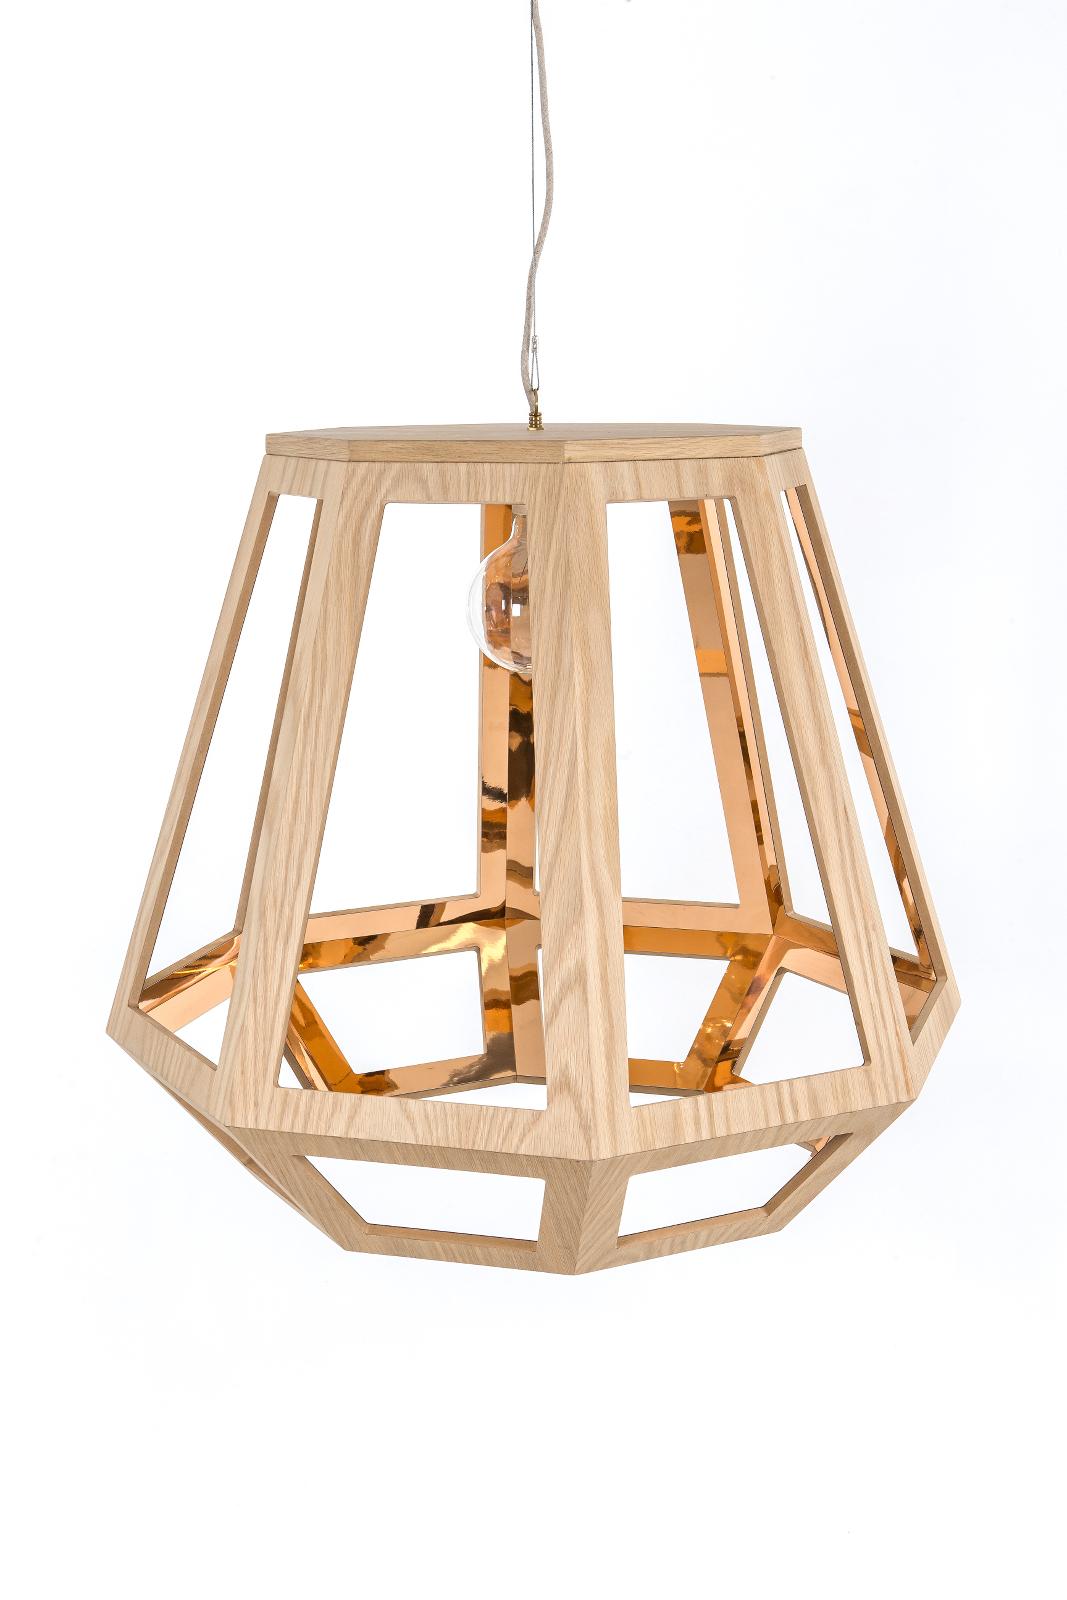 Verlichting | Lamp ZUID by Cedille | Francoise Oostwegel | Lighting ...